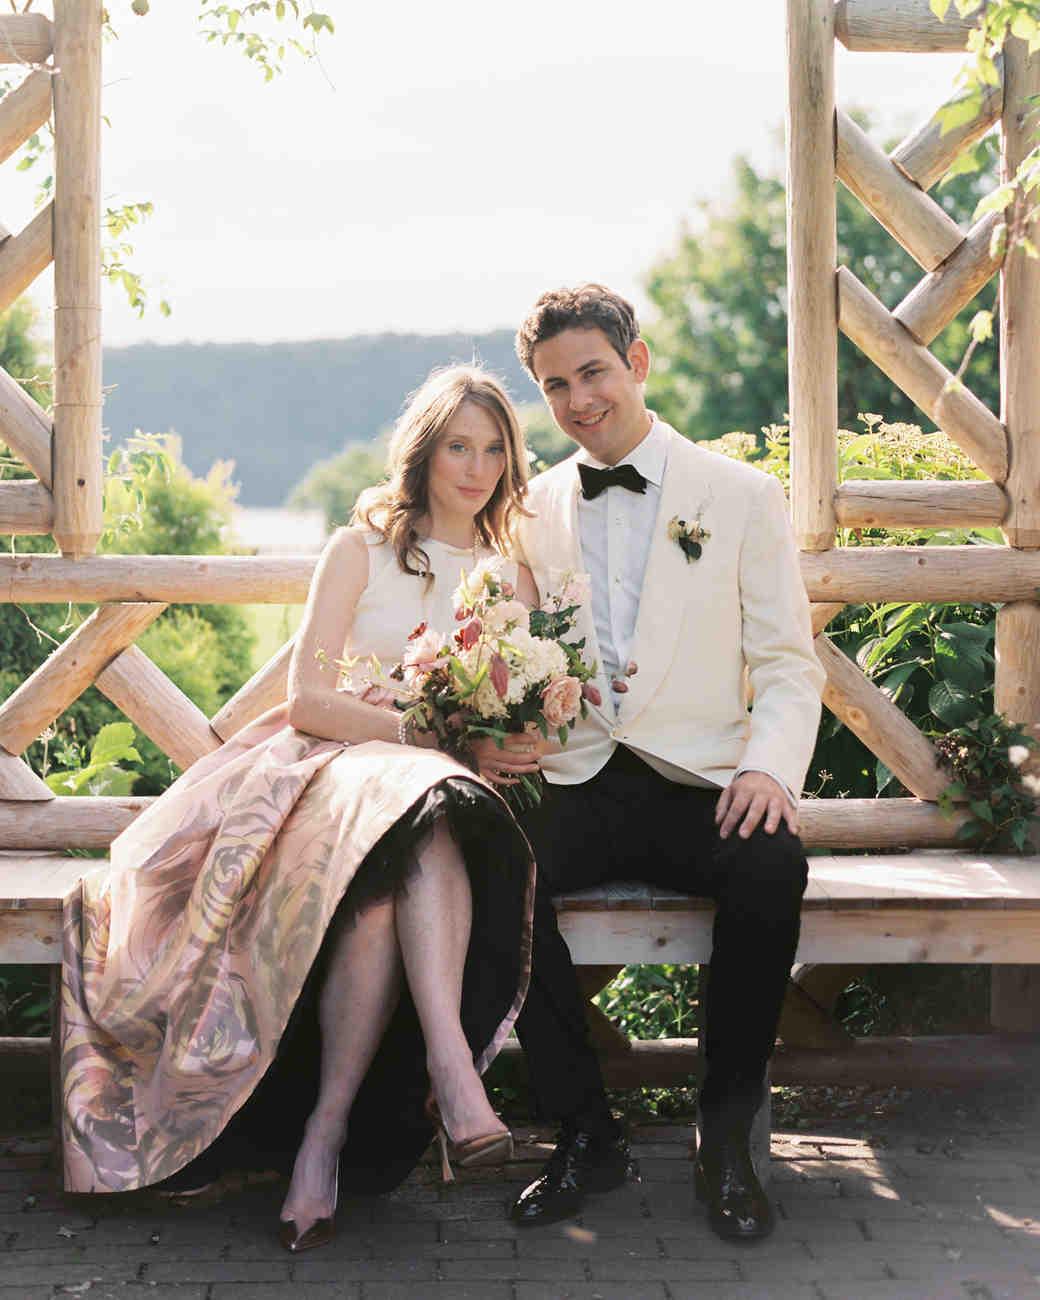 emily-marco-wedding-seated-portrit-0414.jpg